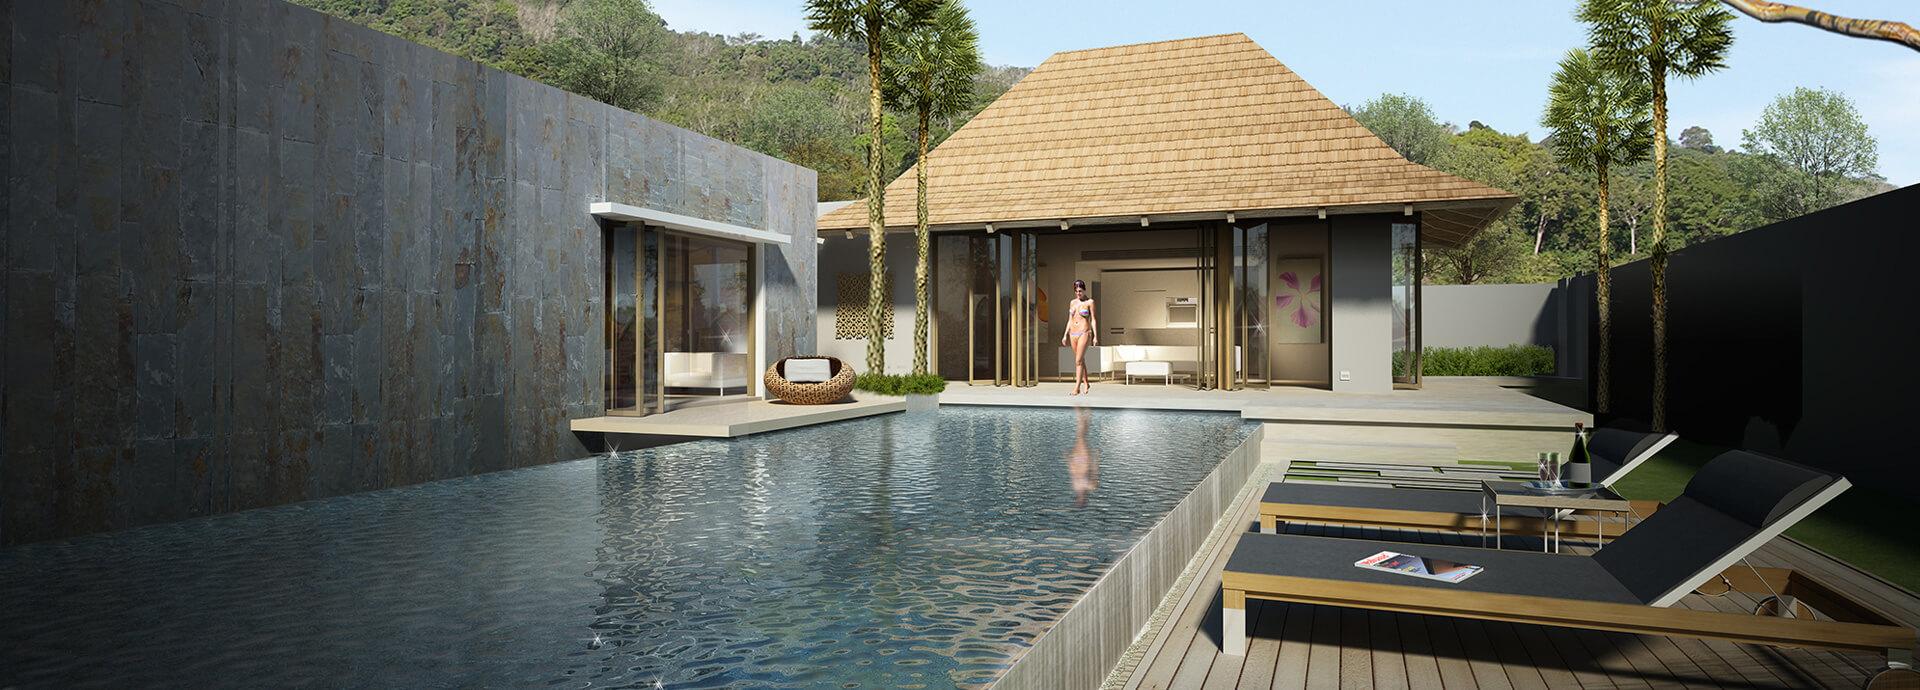 See Stunning 3 bedroom pool villas 1606 details